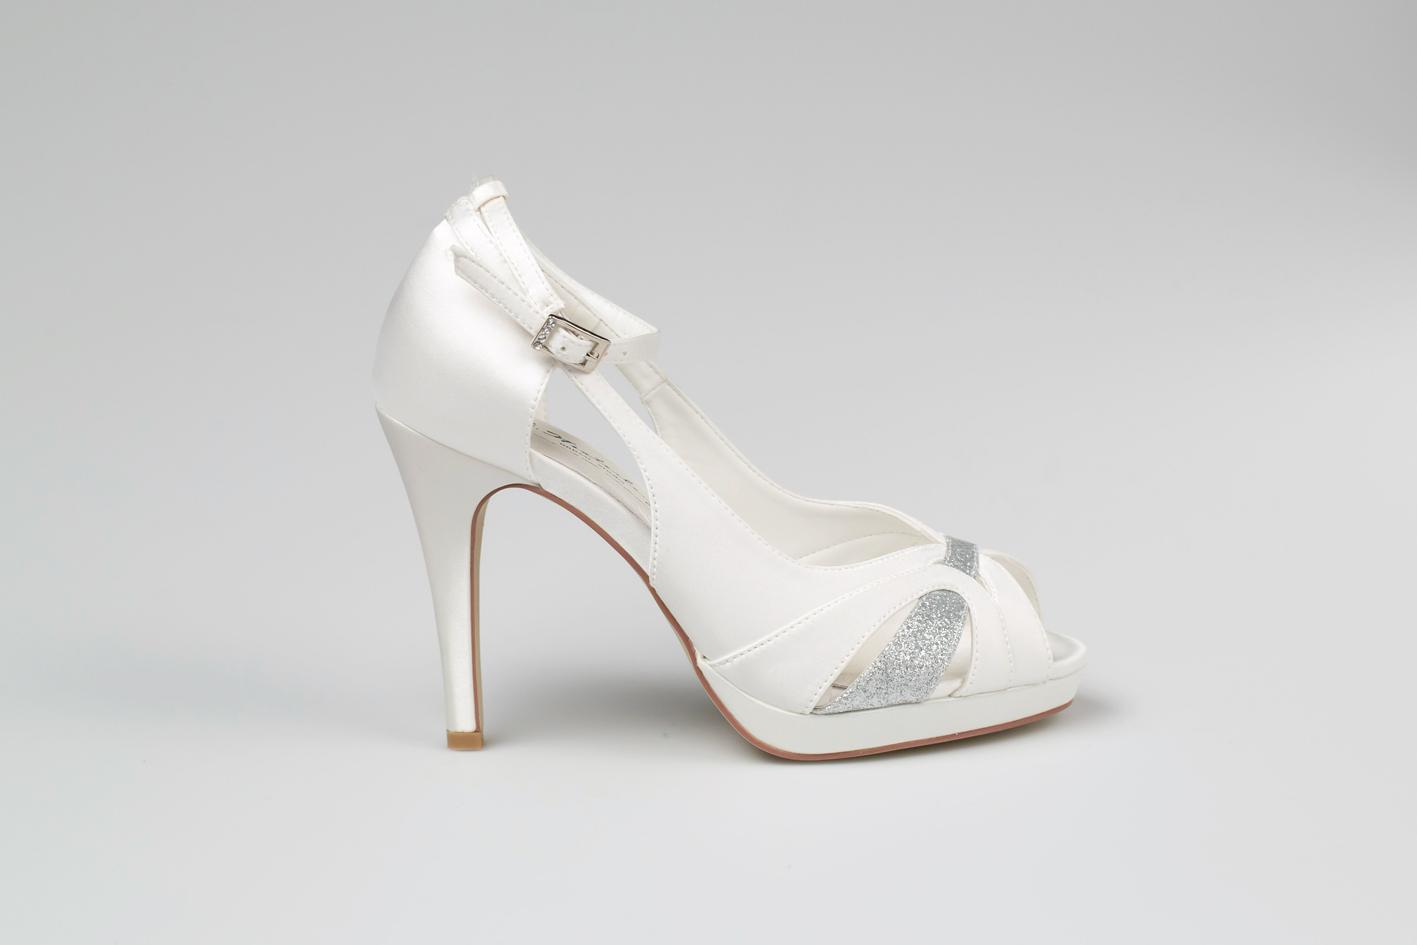 NORAH - Westerleigh cipő. 22.500 Ft, 11 cm sarok.